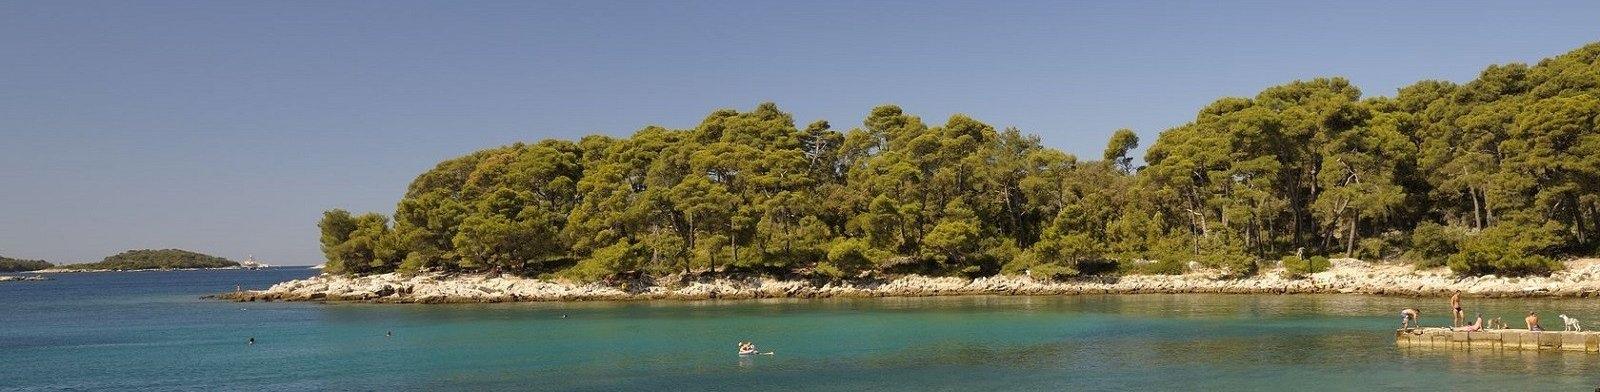 Istria landscape